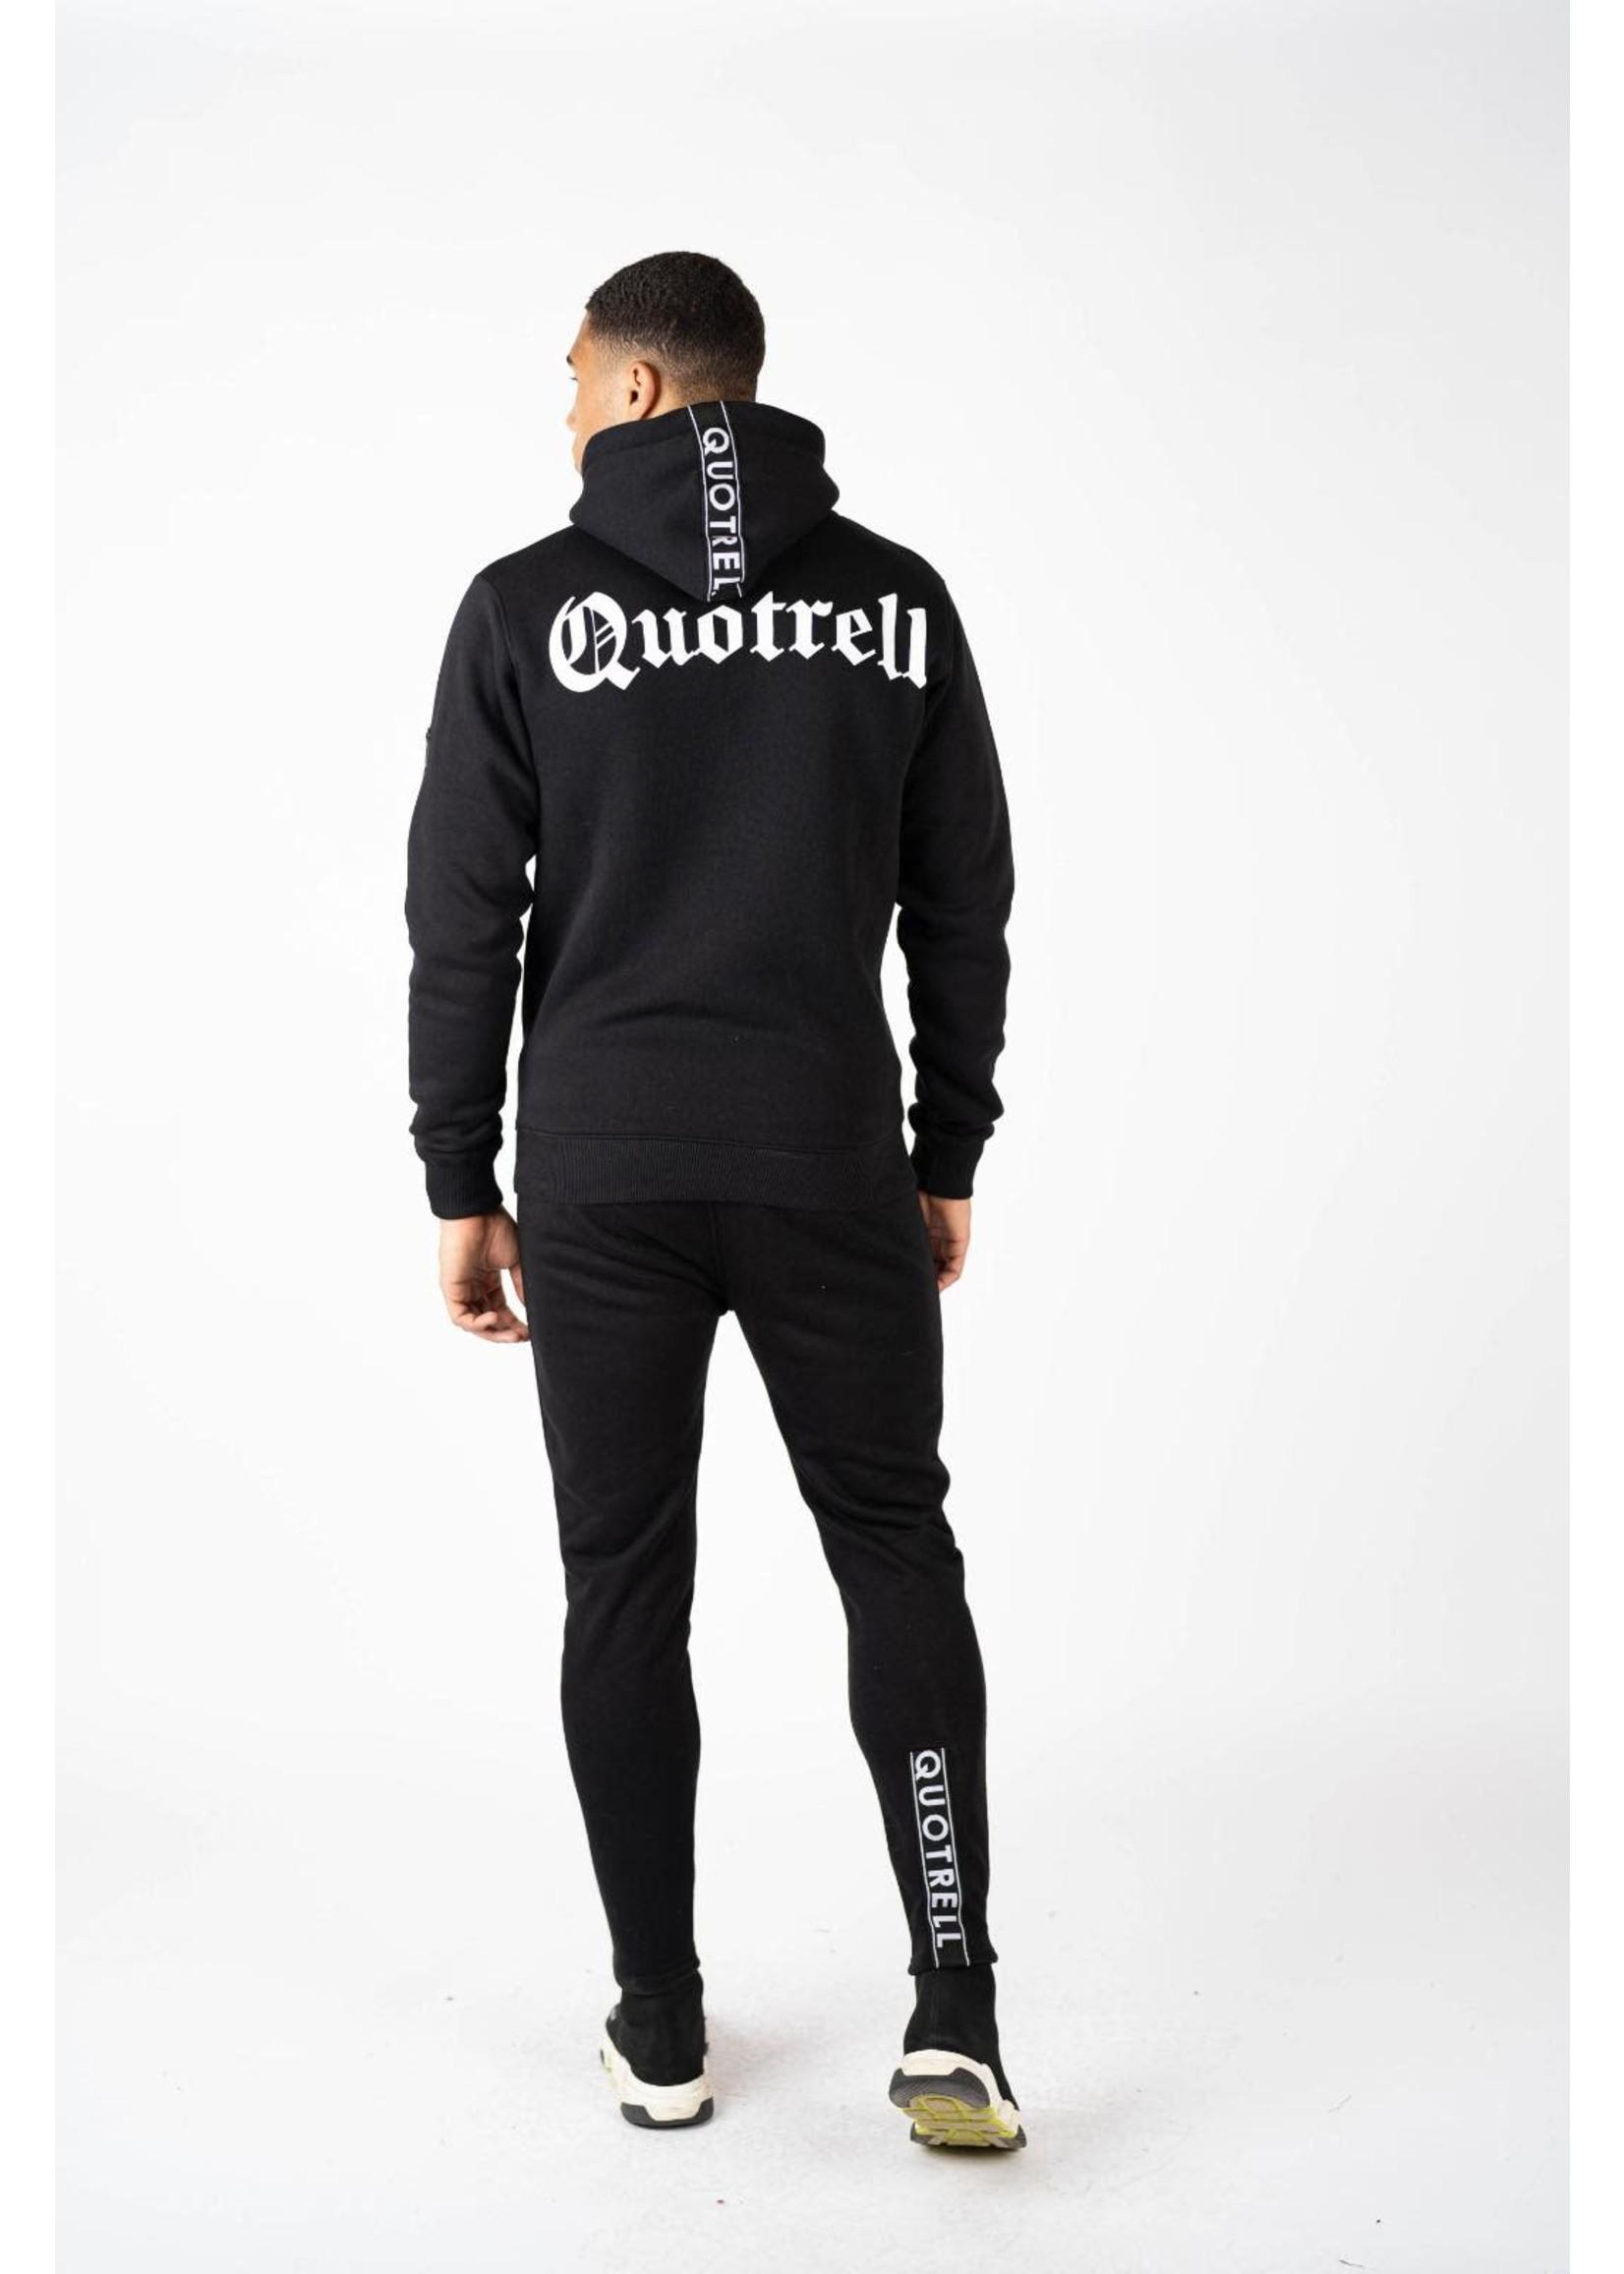 Quotrell QUOTRELL Commdore Pants - Black